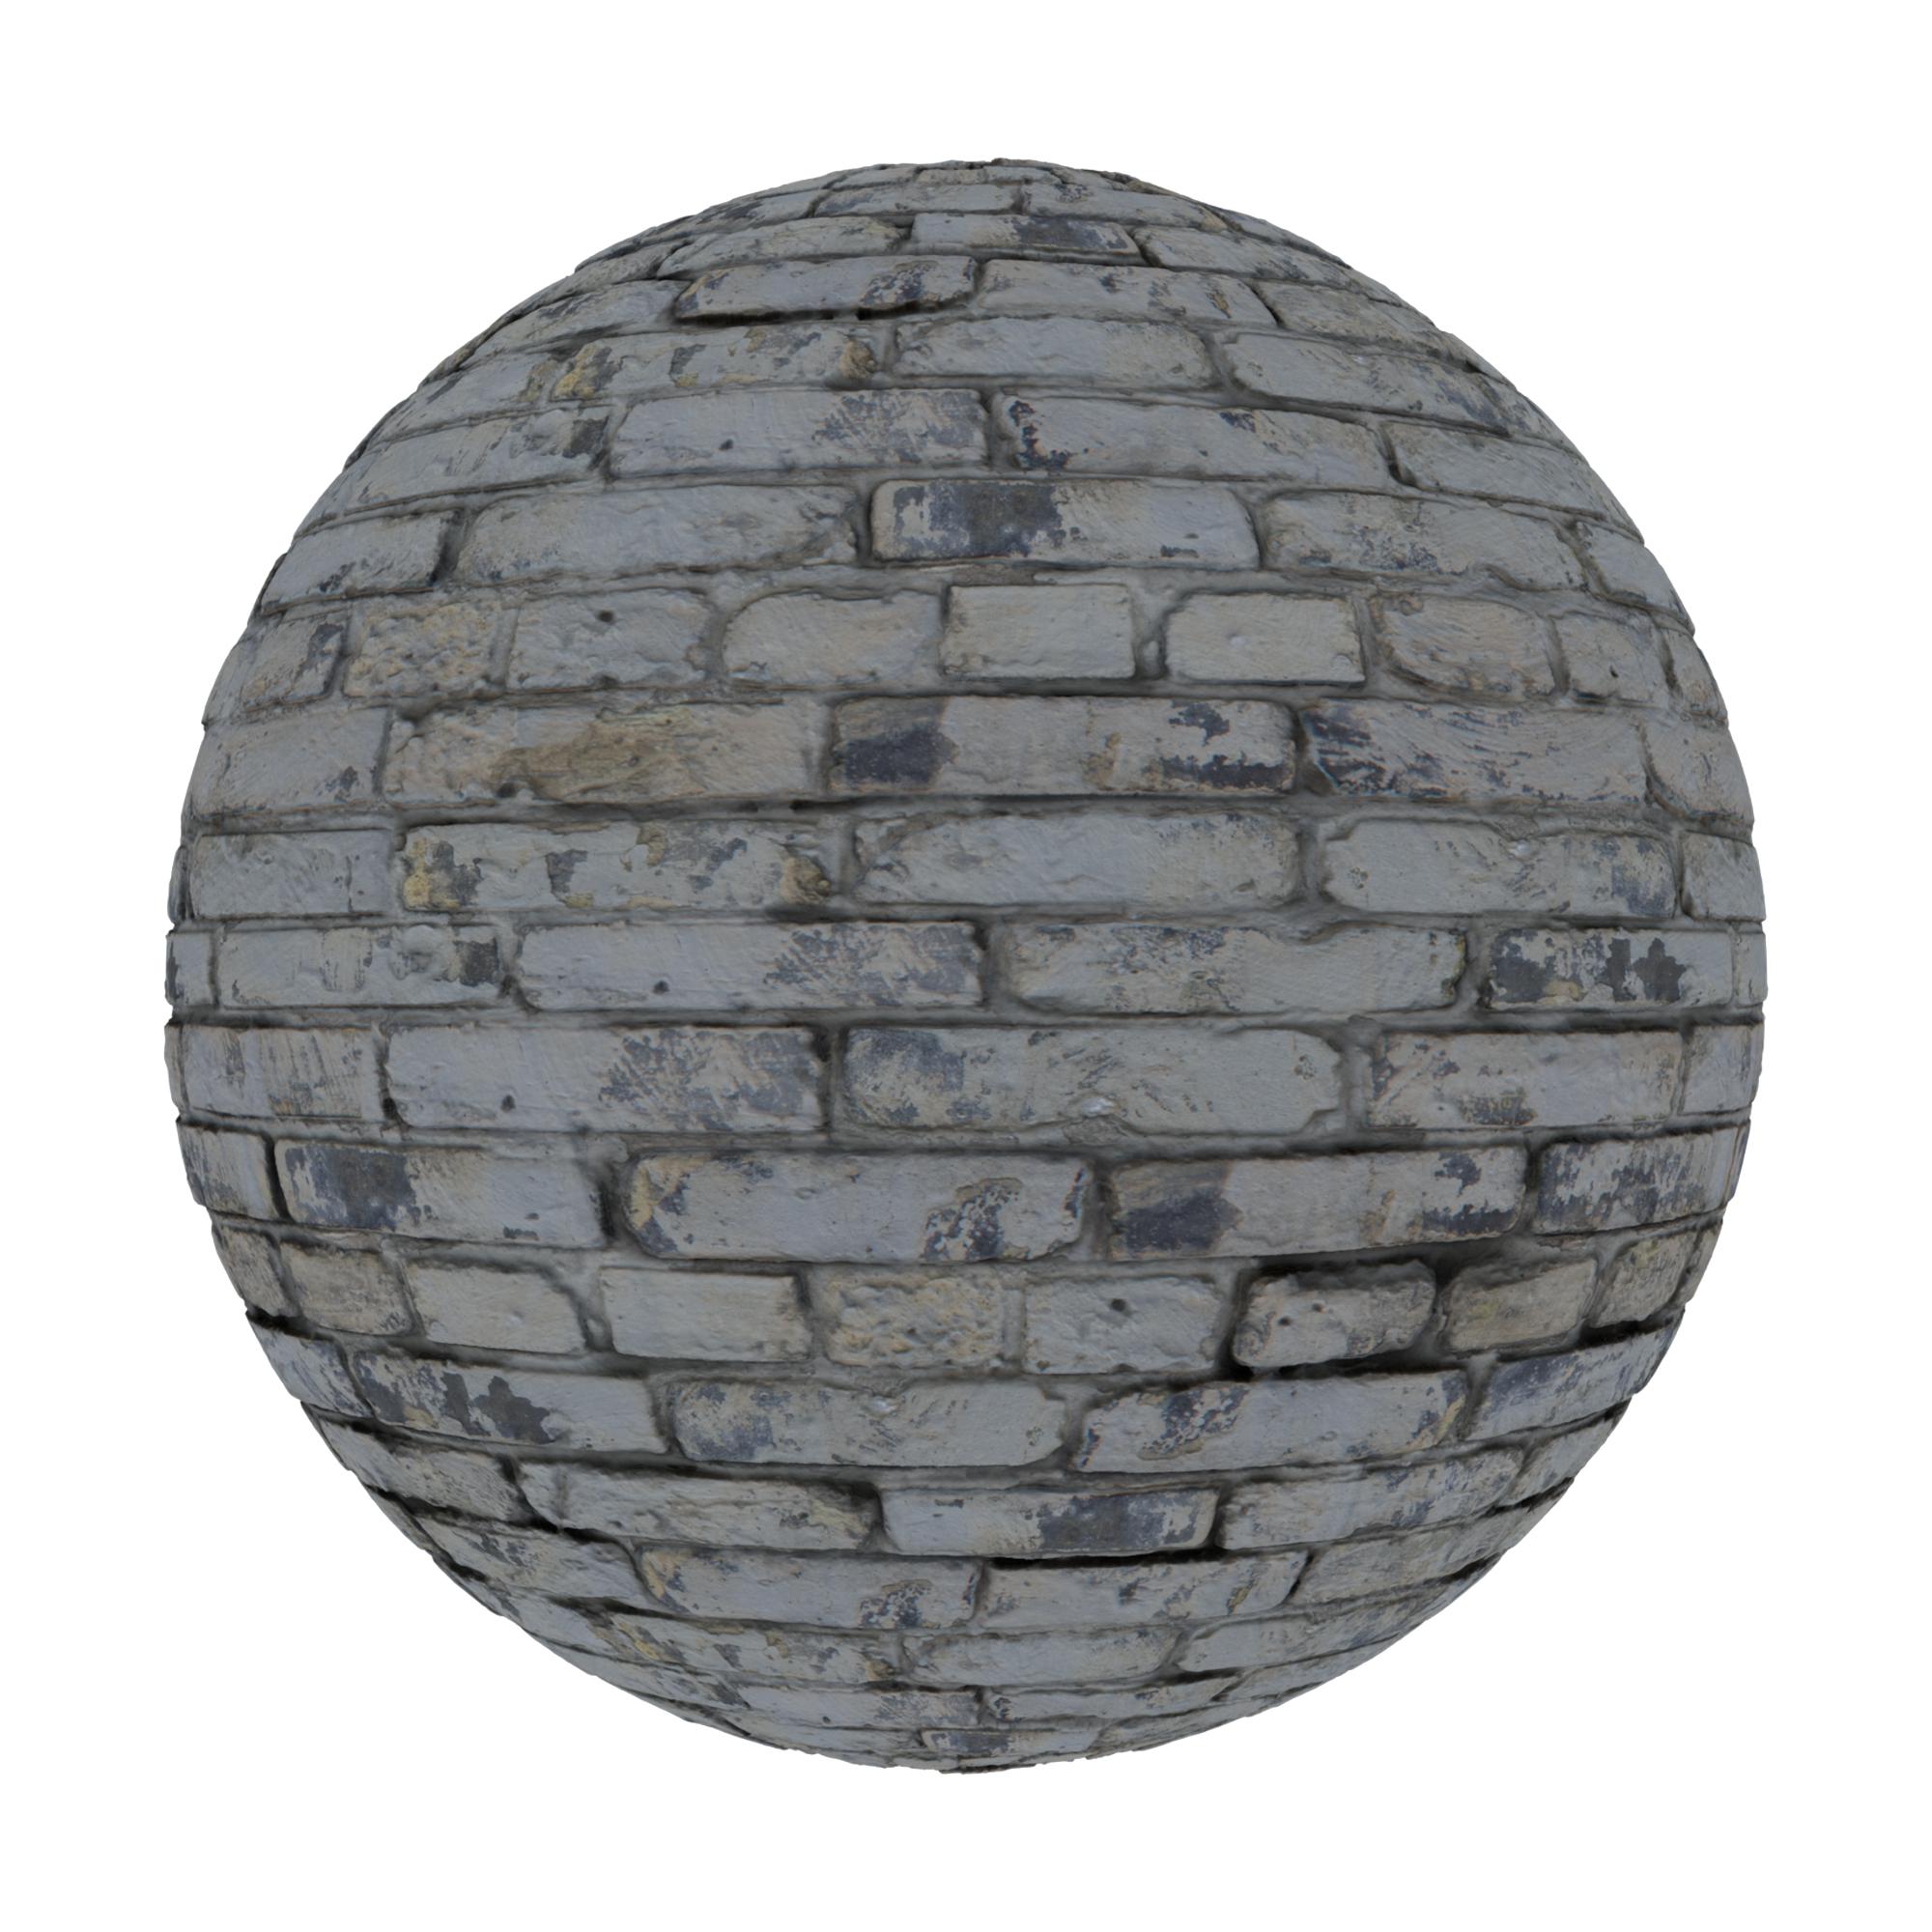 Bricks White Washed Old Light Sphere